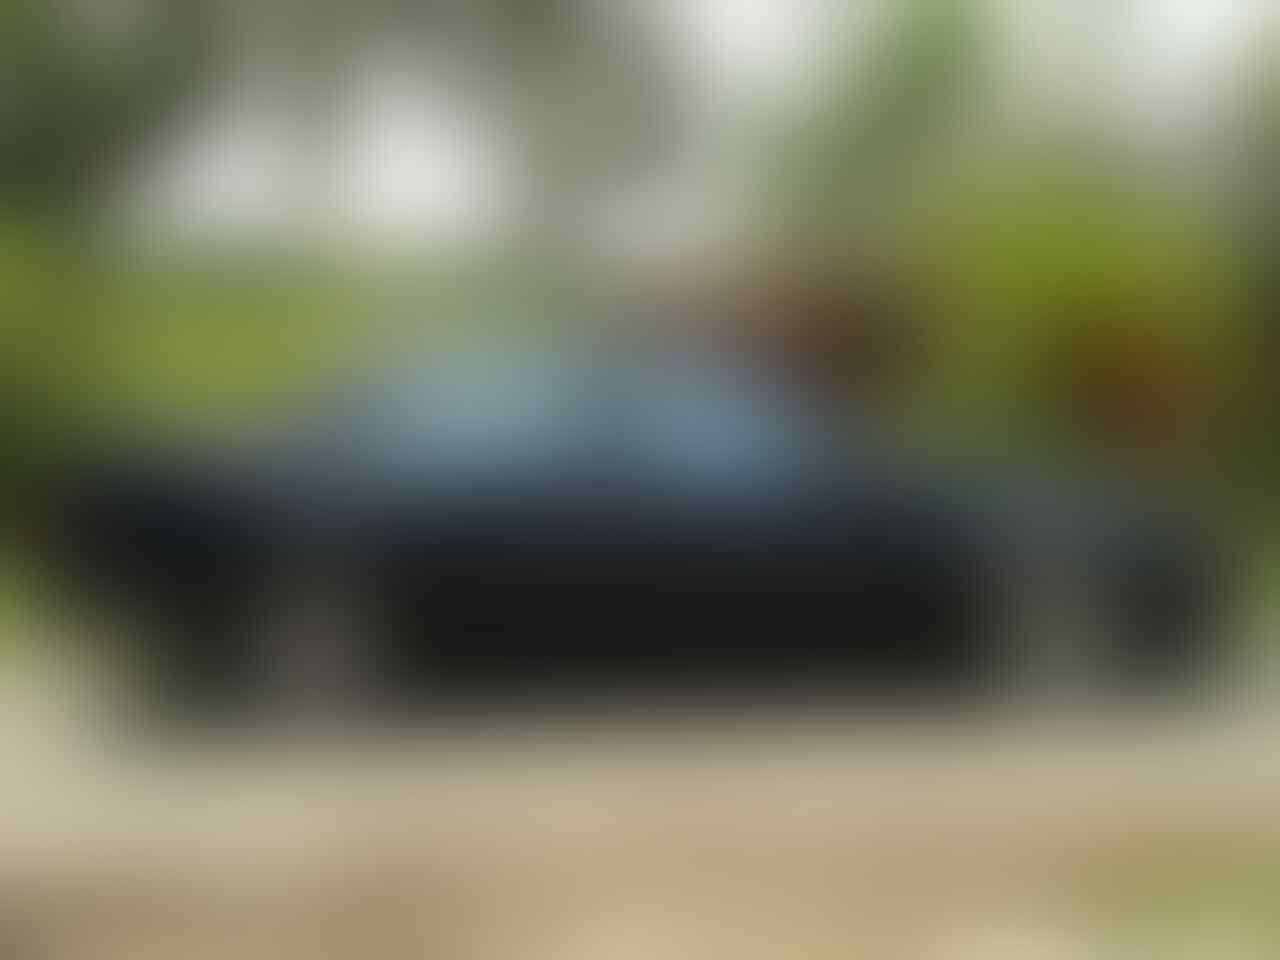 JUAL: Honda Accord Prestige '89 Akhir M/T Solo